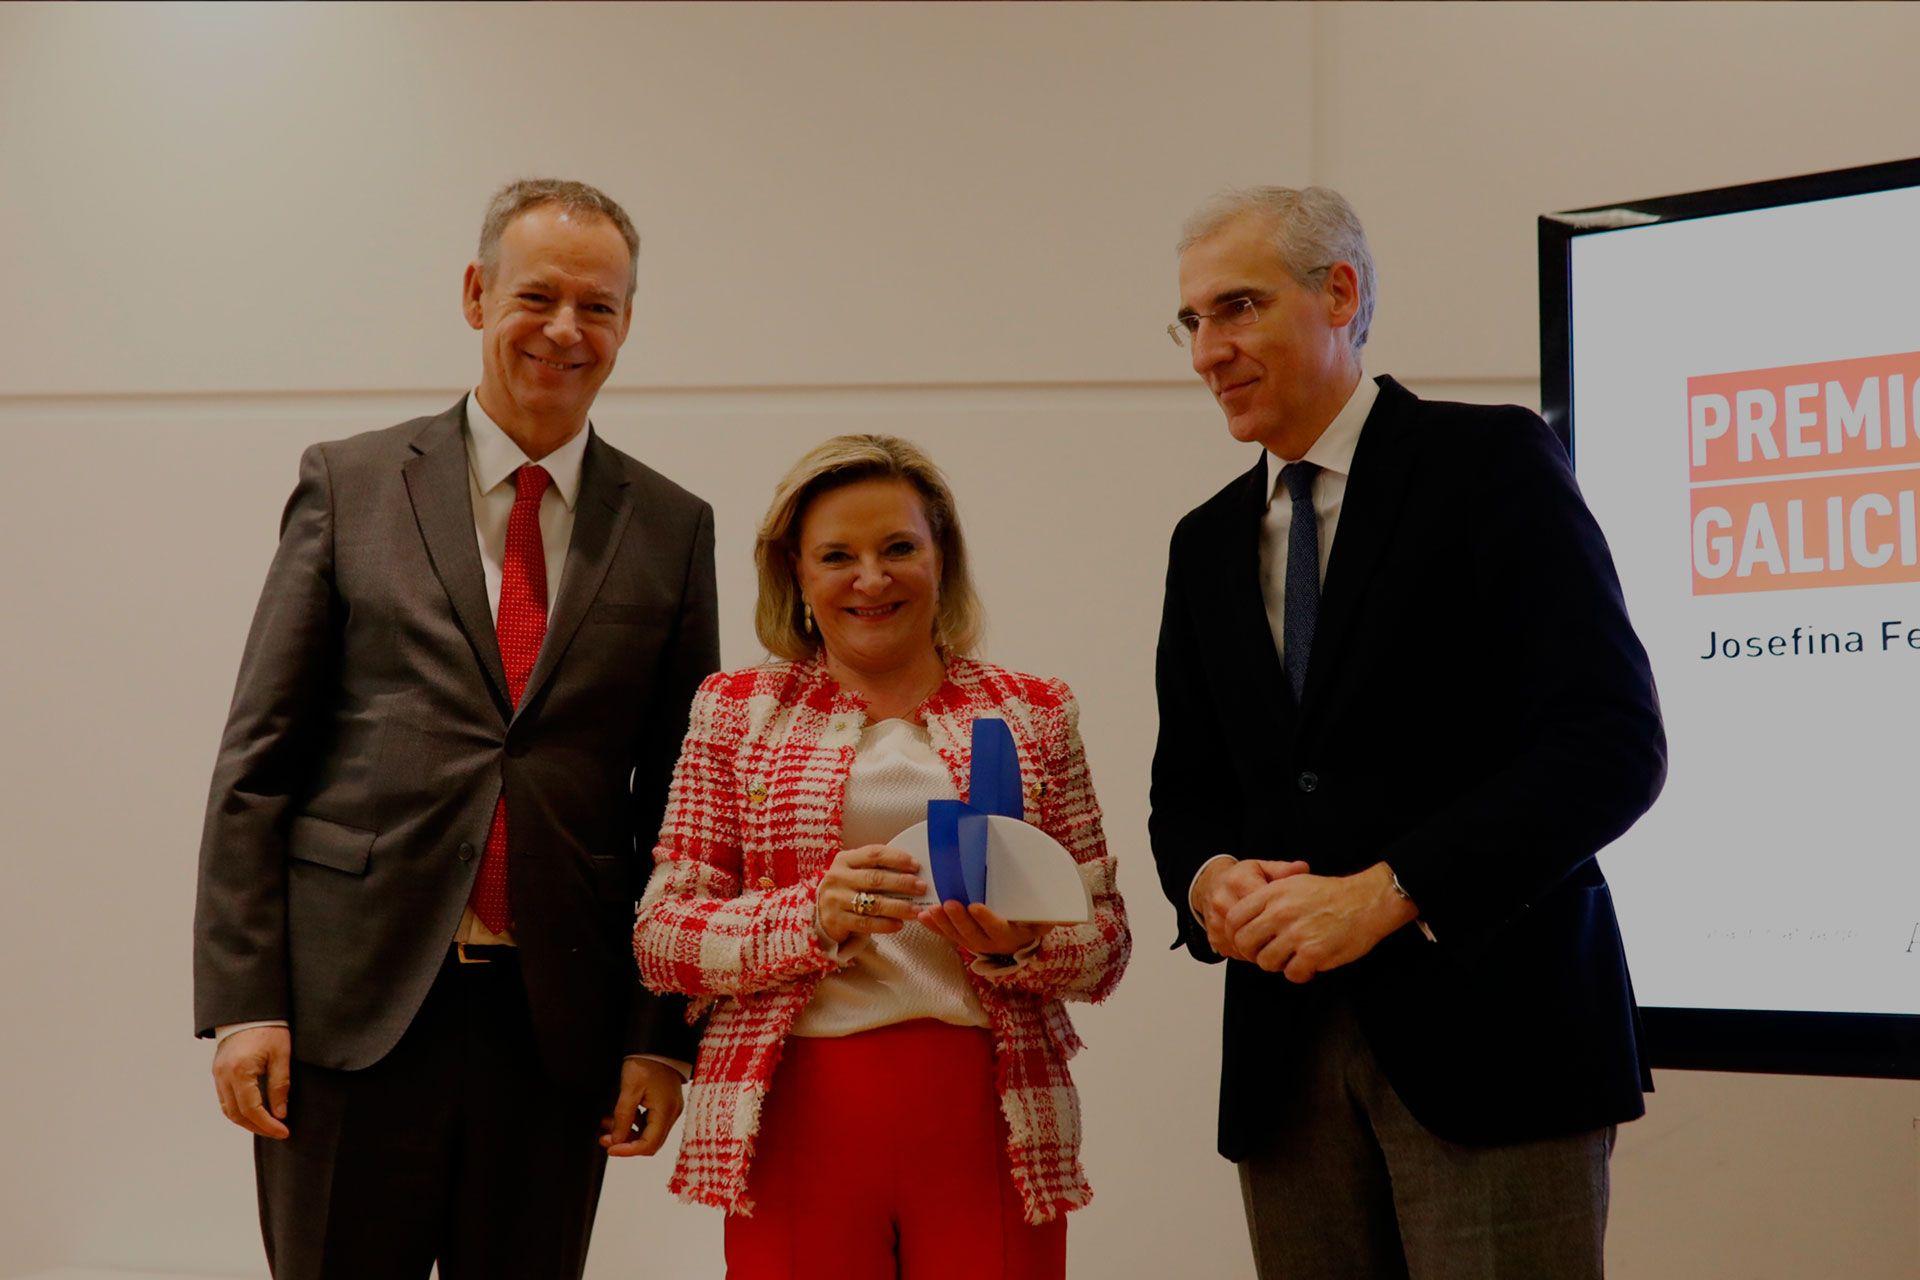 osefina Fernández, CEO de DomusVi, recibe el Premio Galicia Global 2019